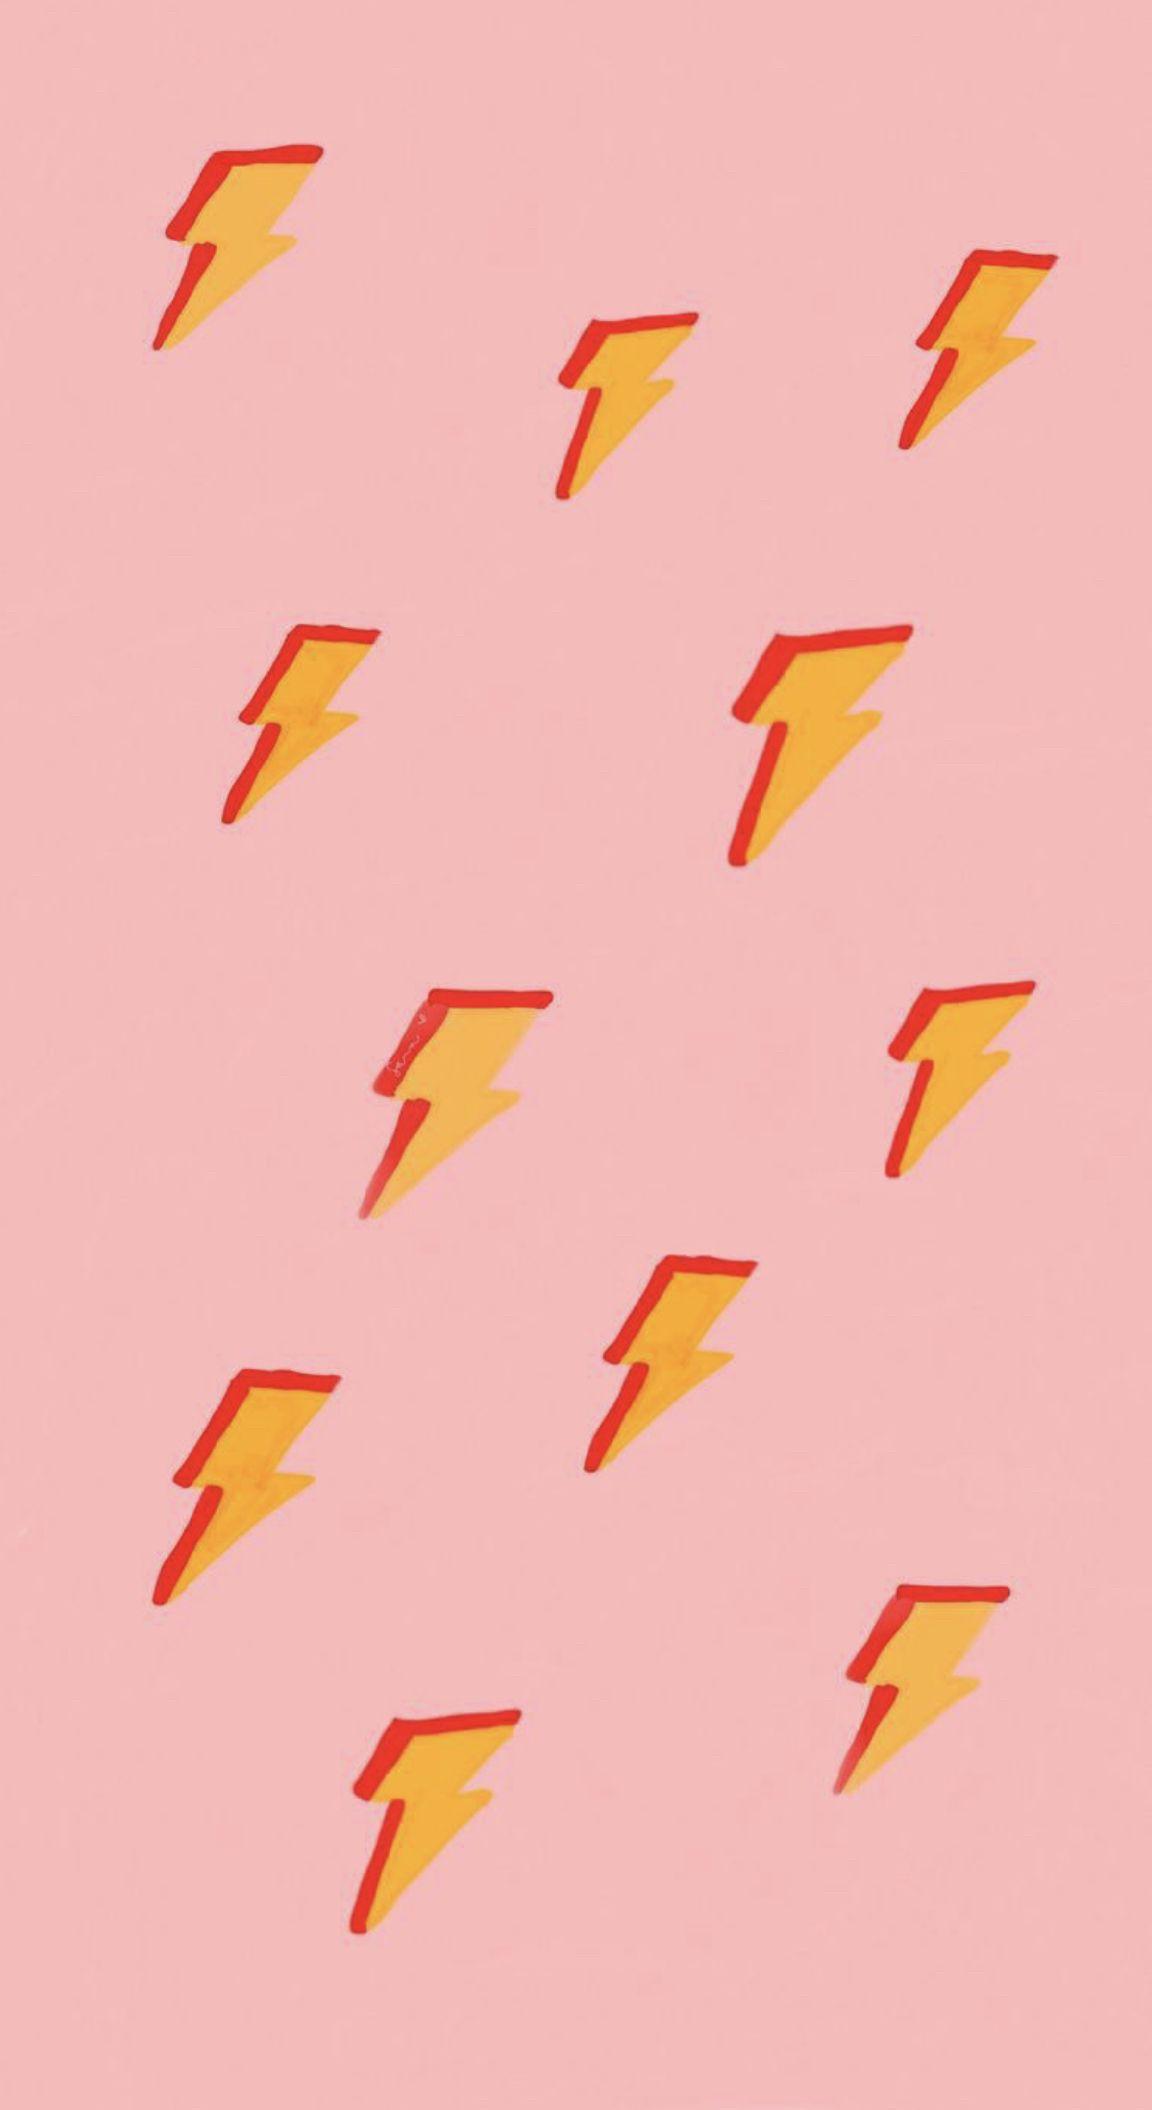 Aesthetic Pattern Wallpaper Tumblr